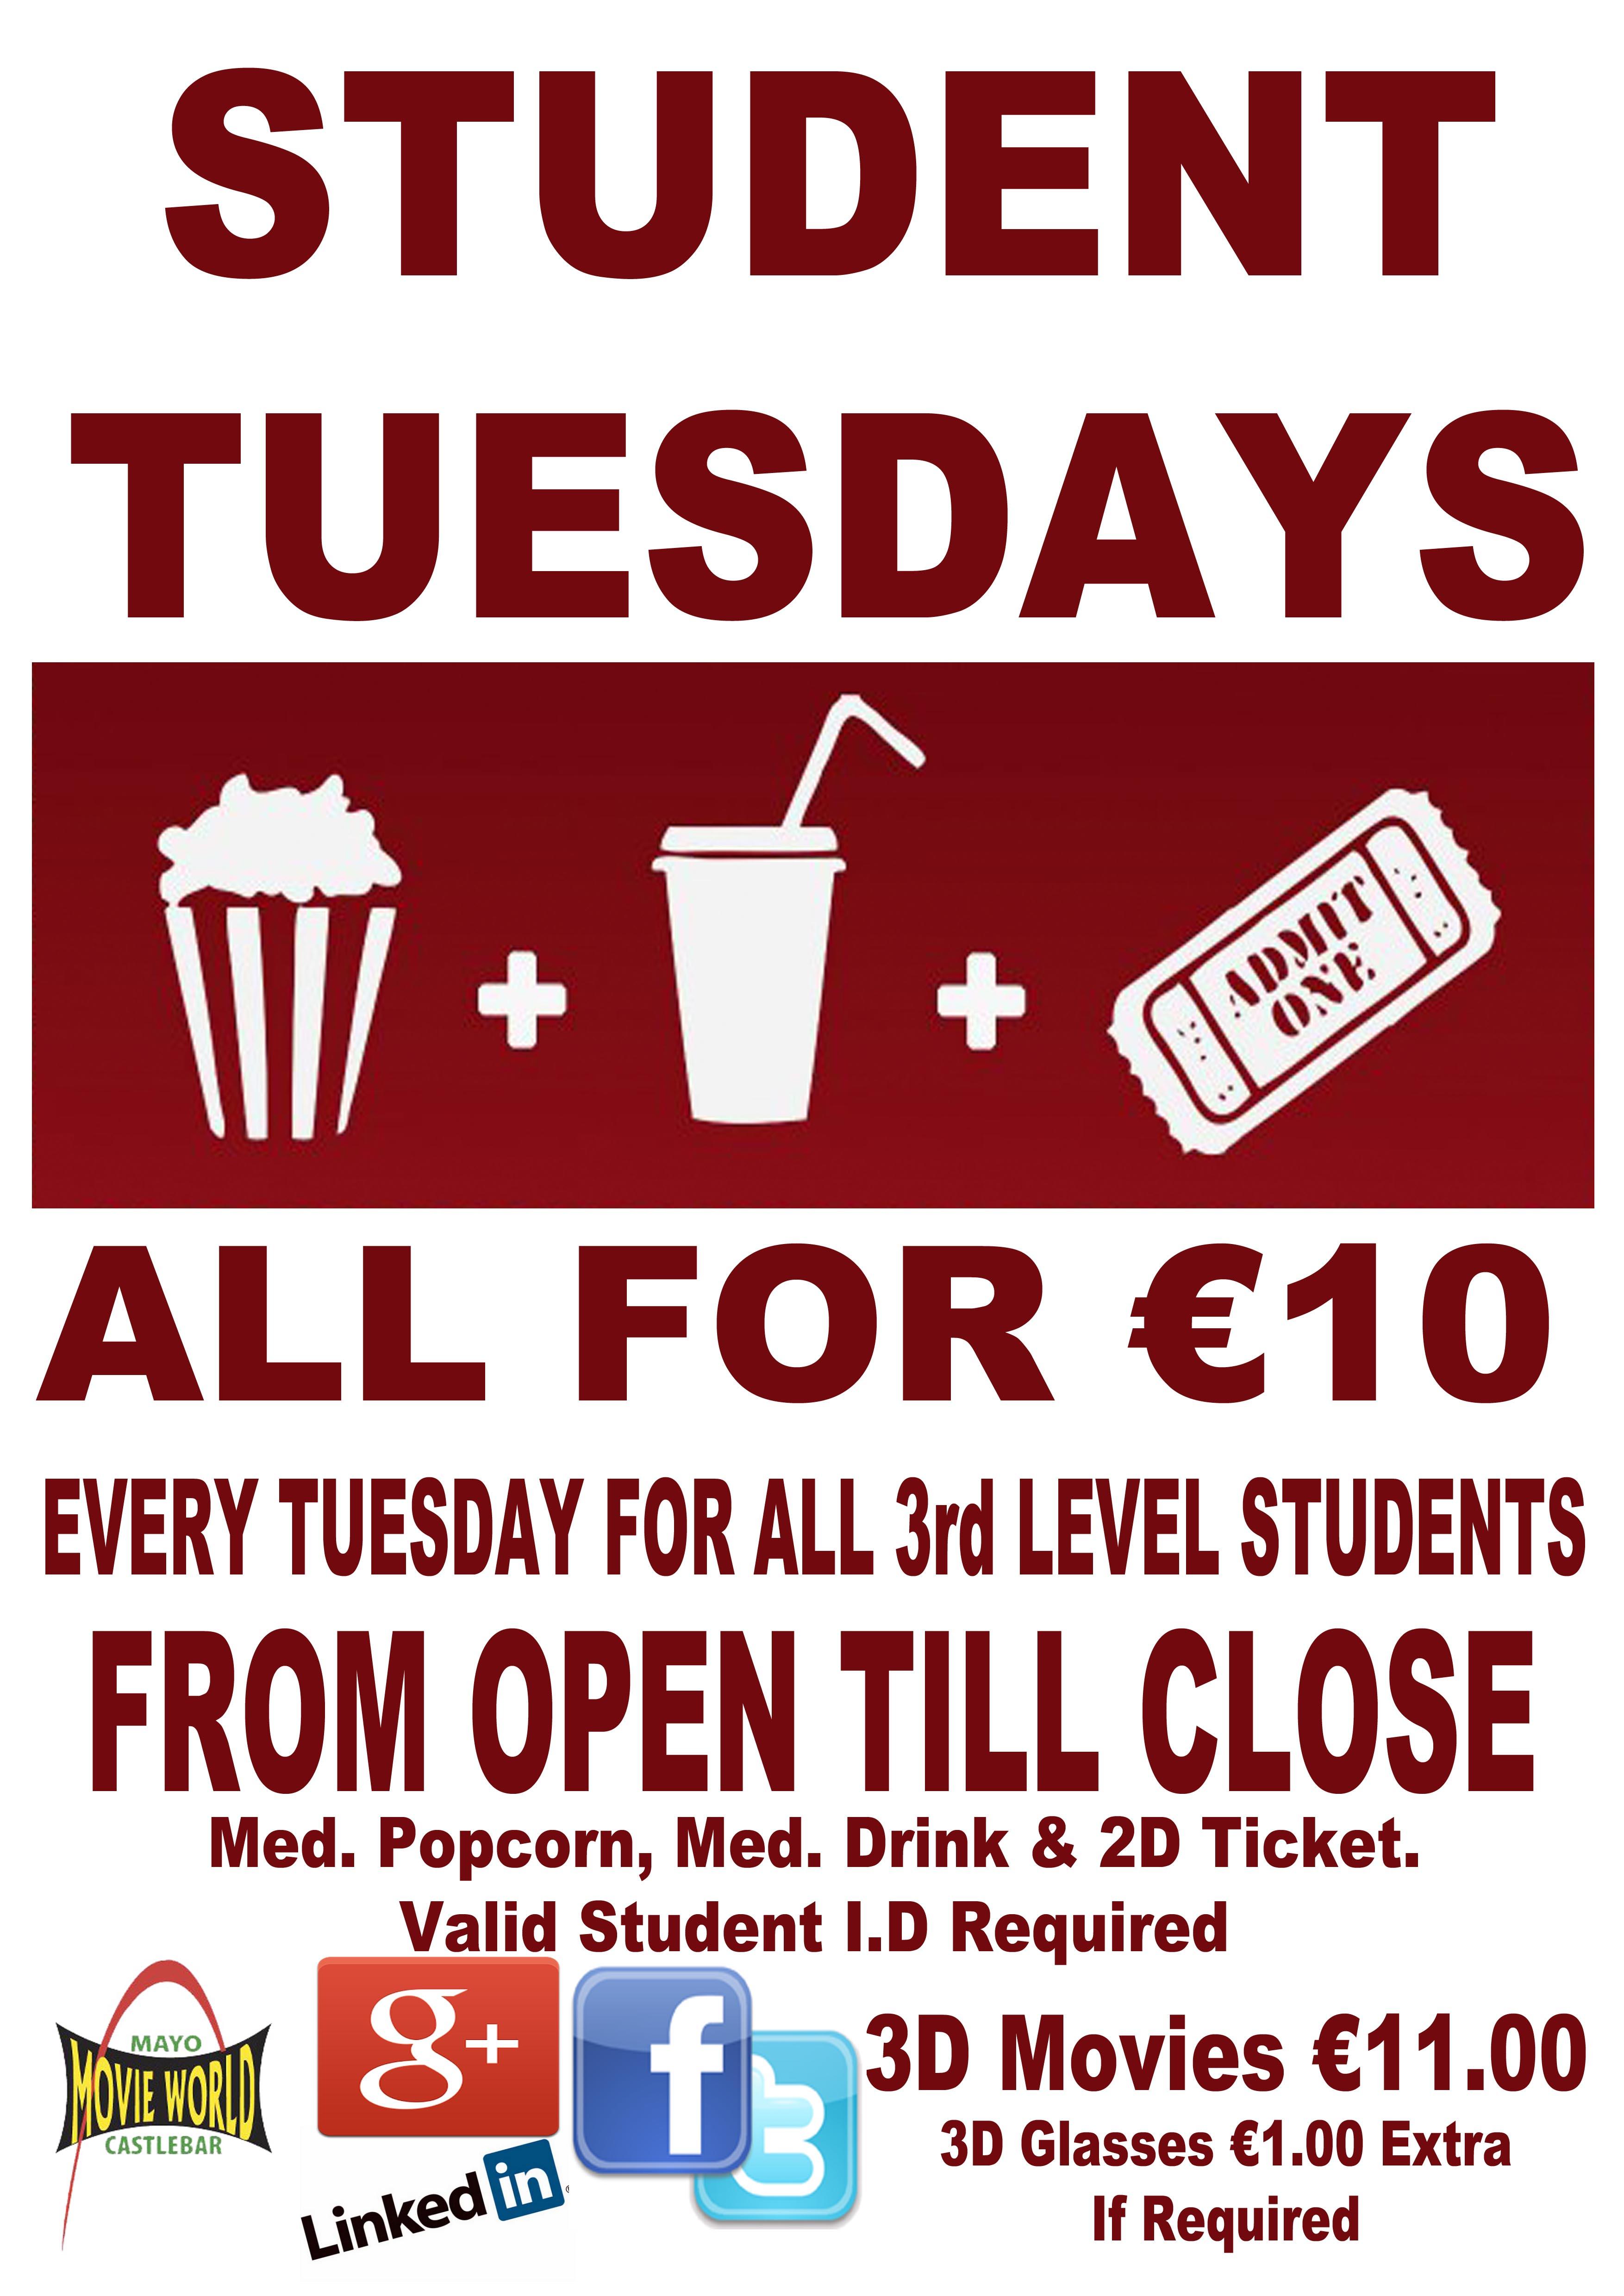 Student_Tuesday.jpg